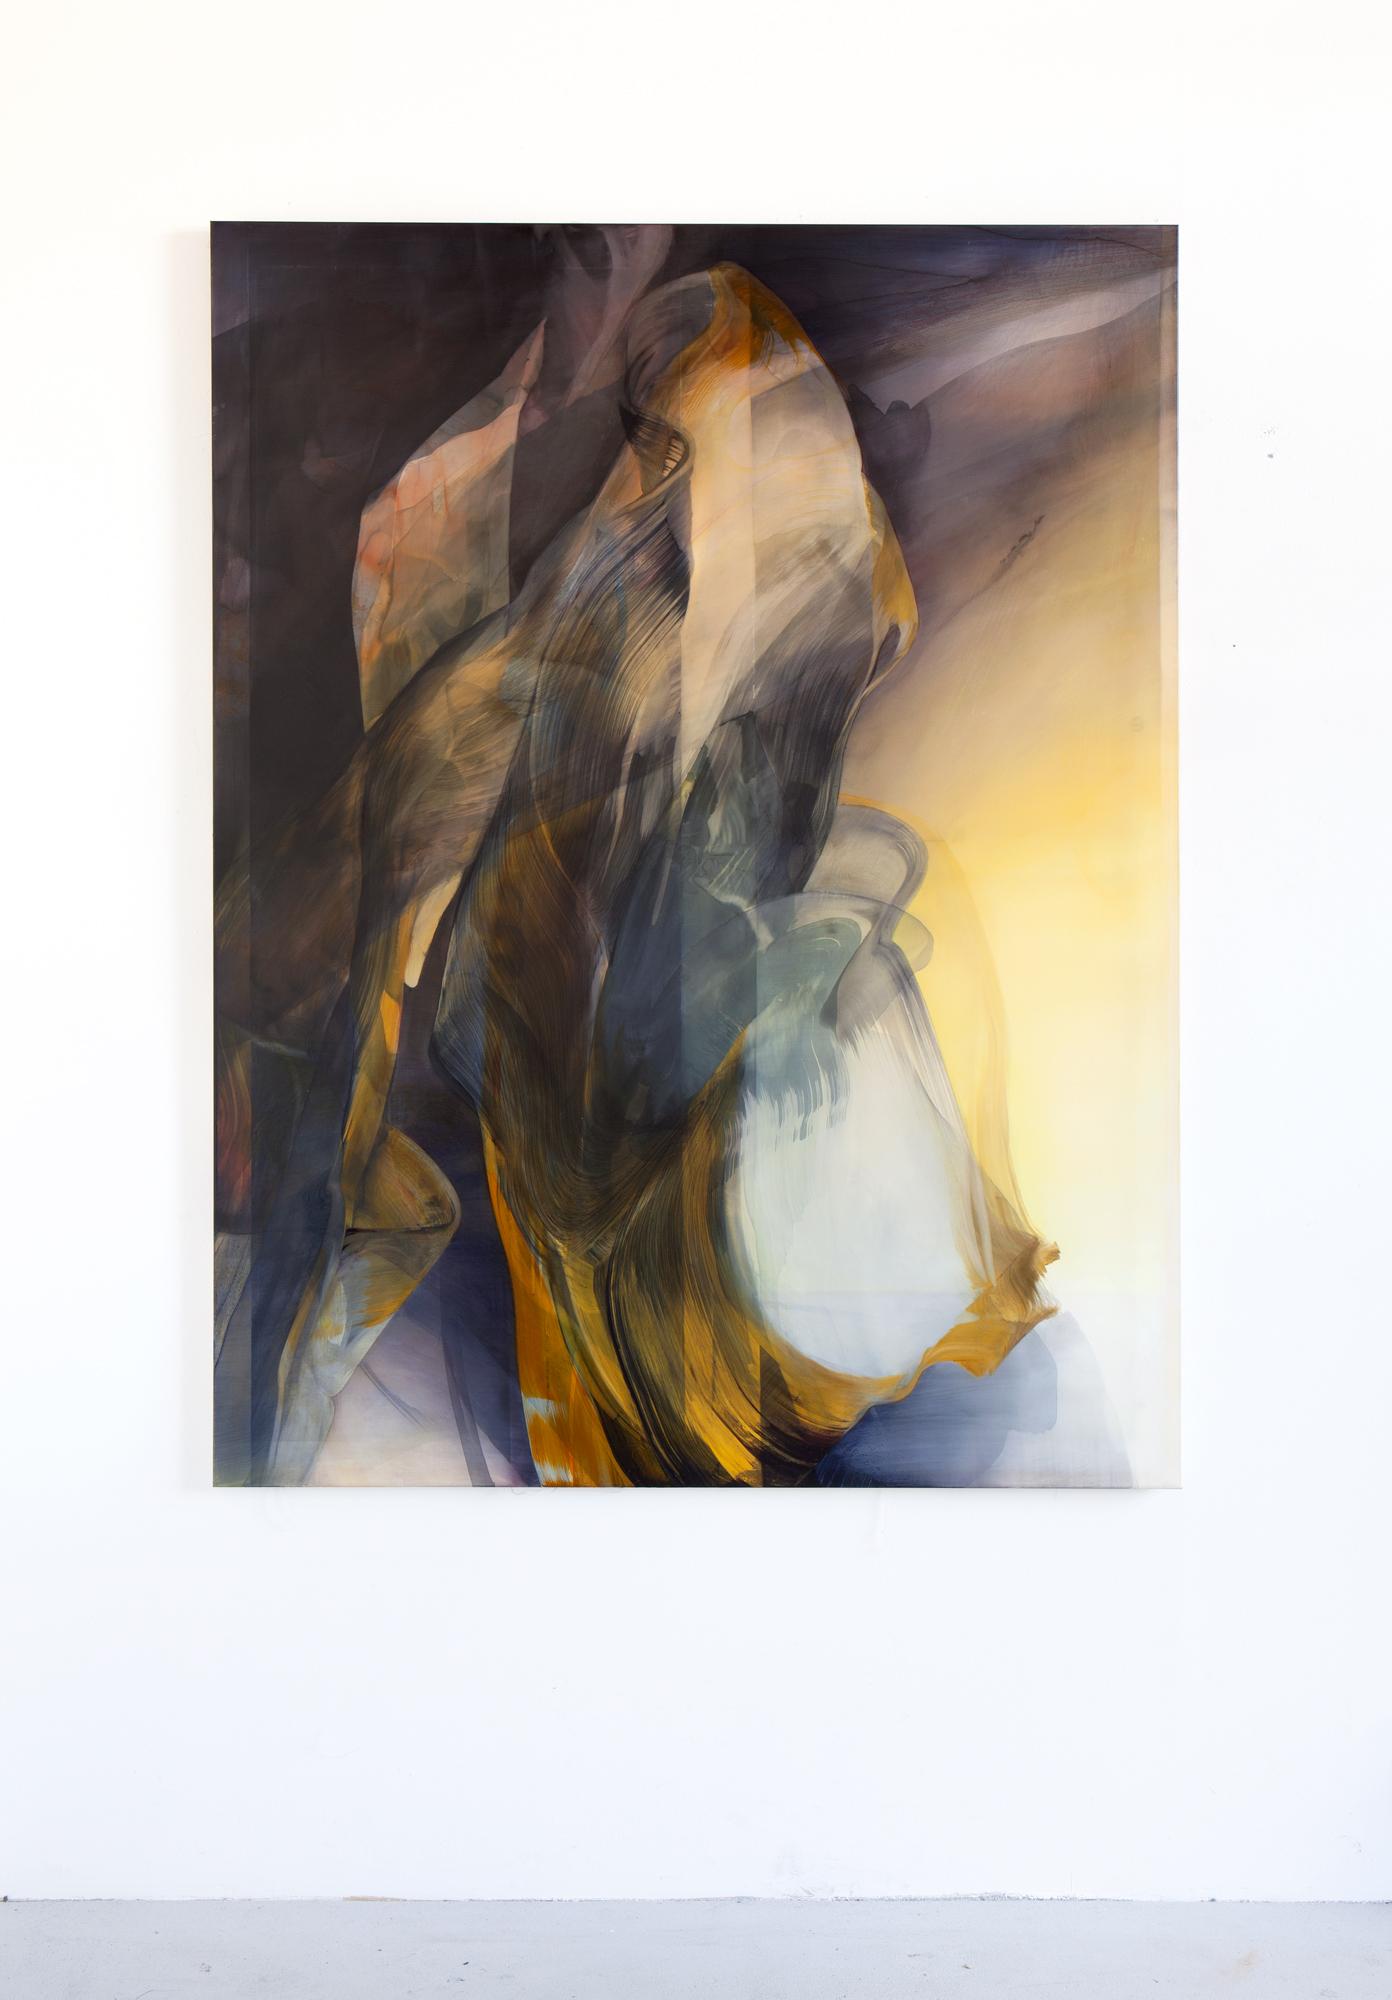 © Natascha Schmitten, Untitled, 170 x 130 cm, ink, oil on nylon, 2017